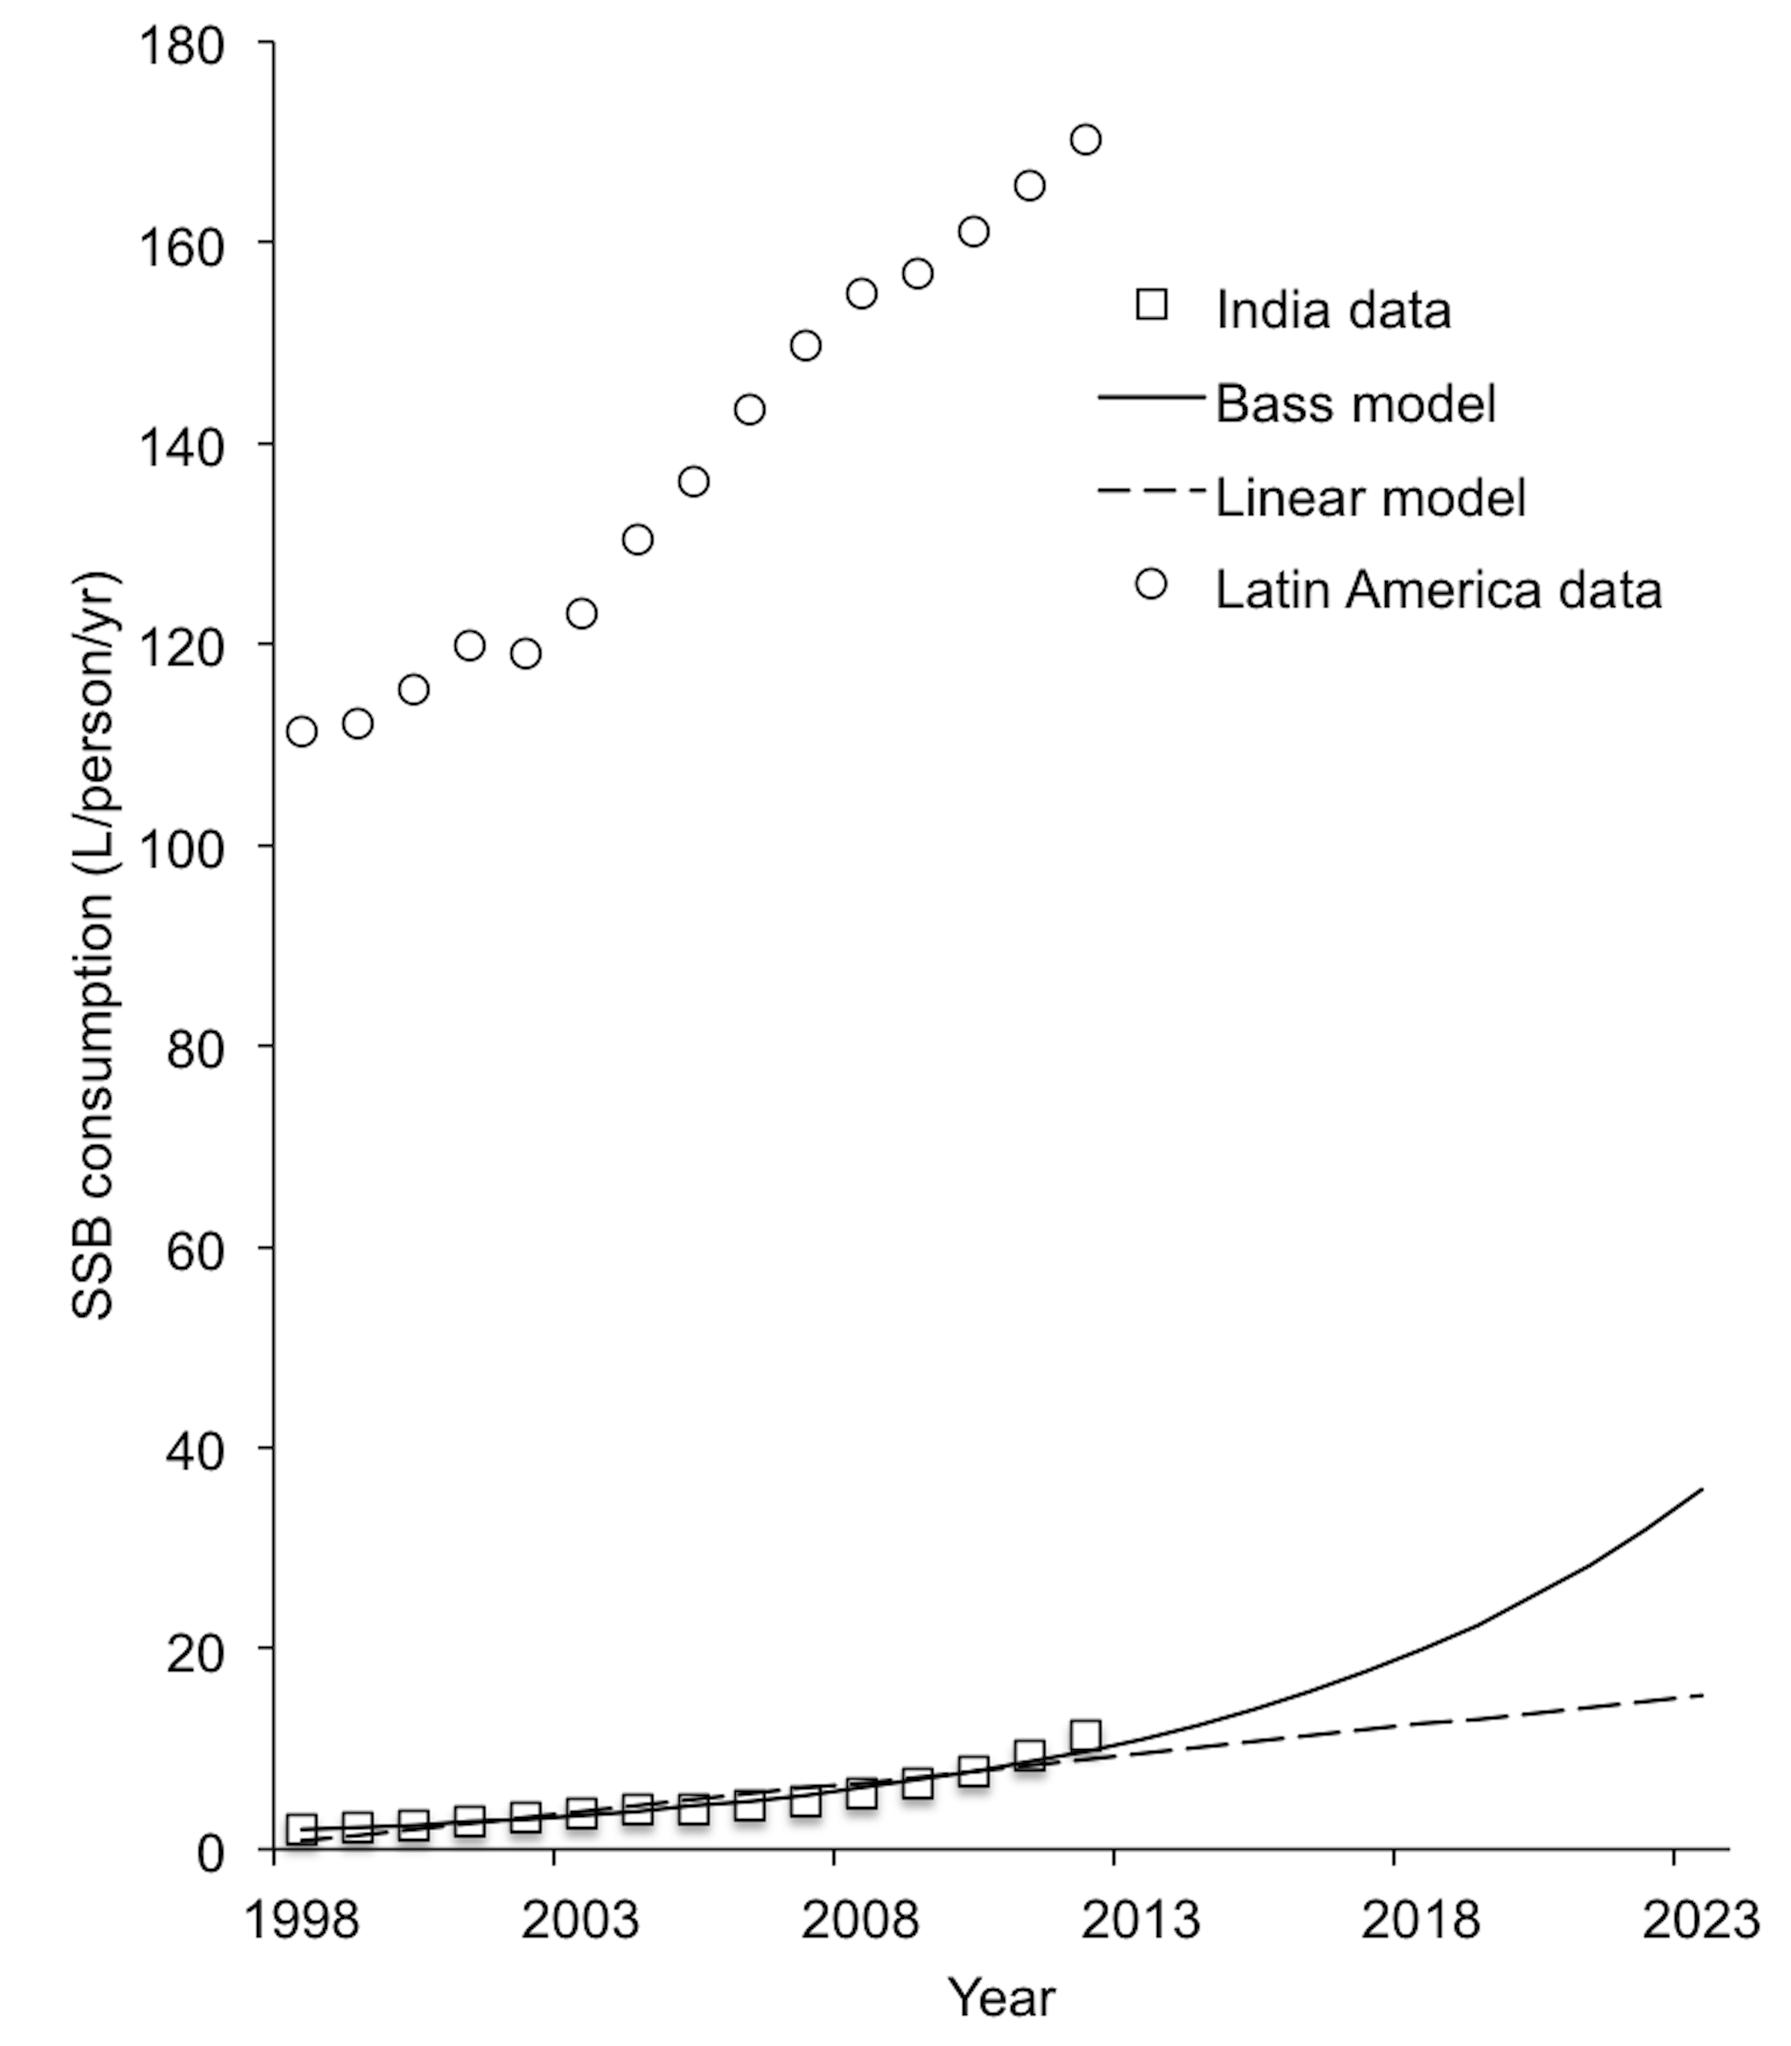 SSB consumption in liters per capita per year in India, 1998–2012 <em class=&quot;ref&quot;>[9]</em>.